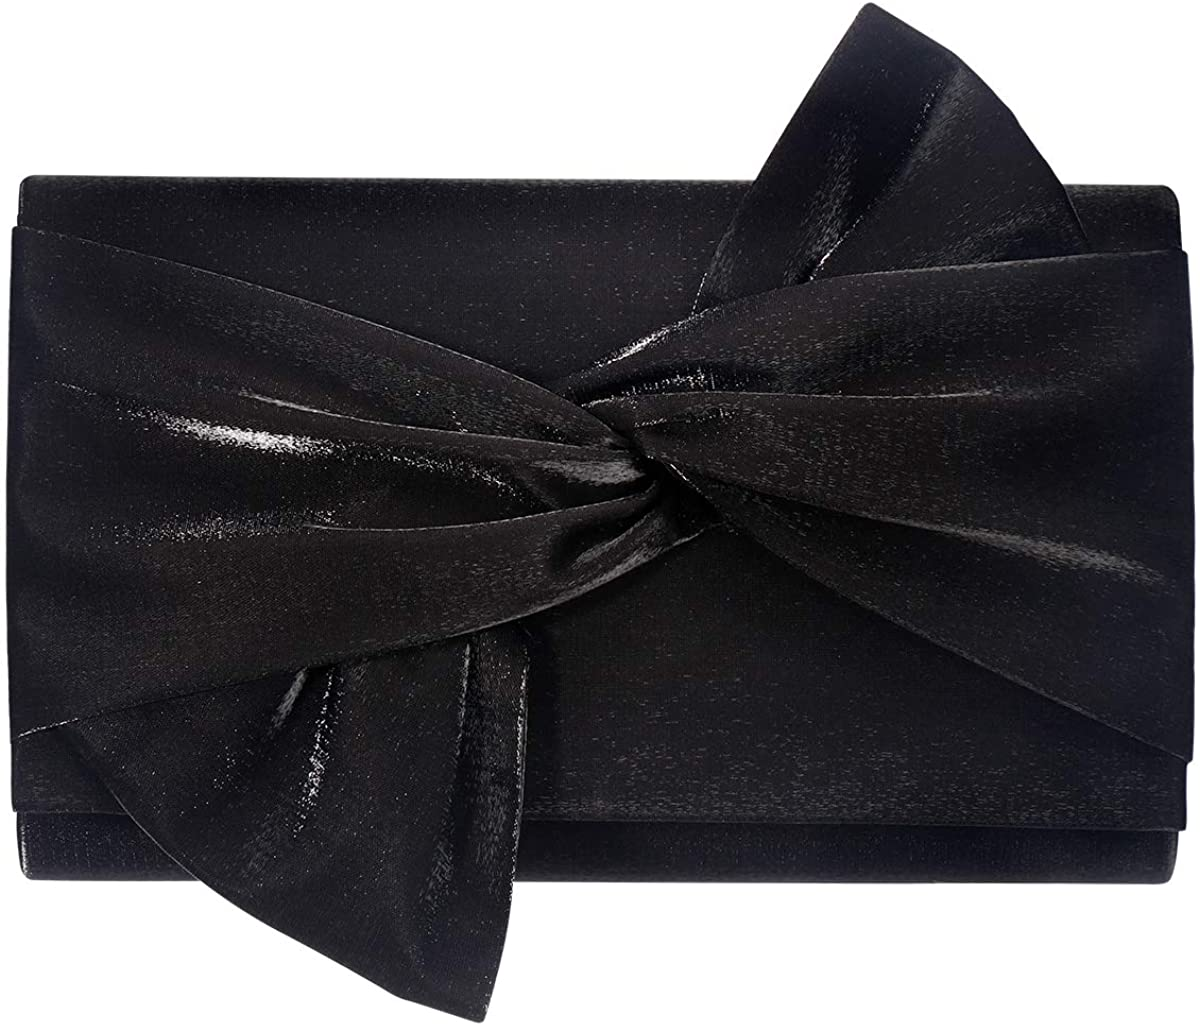 Satin Clutch purse evening bag women party wedding handbag